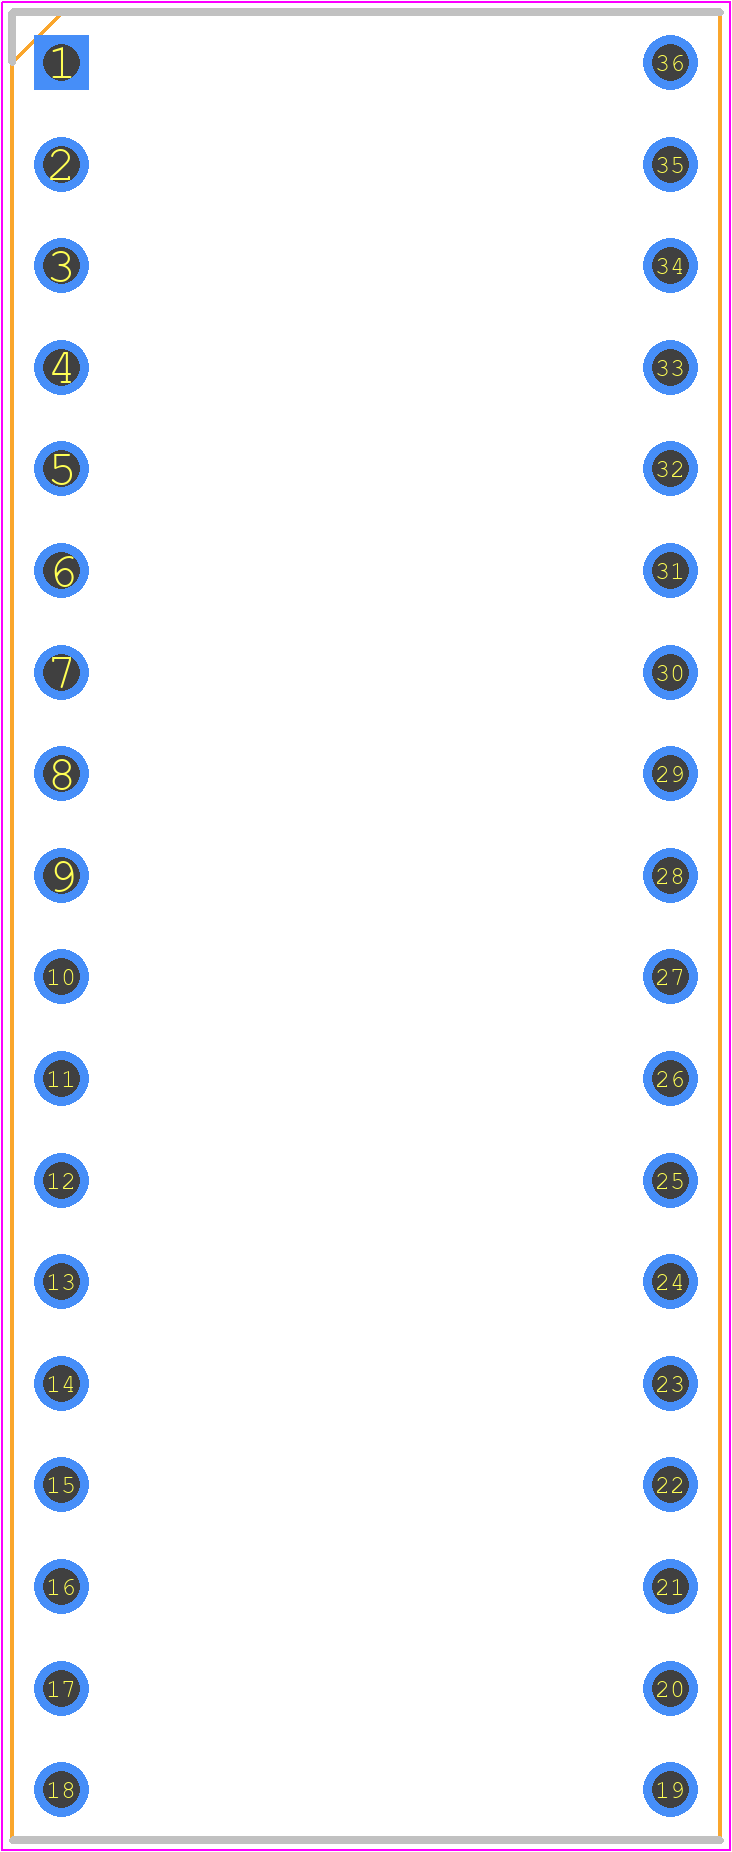 Footprint (SamacSys)